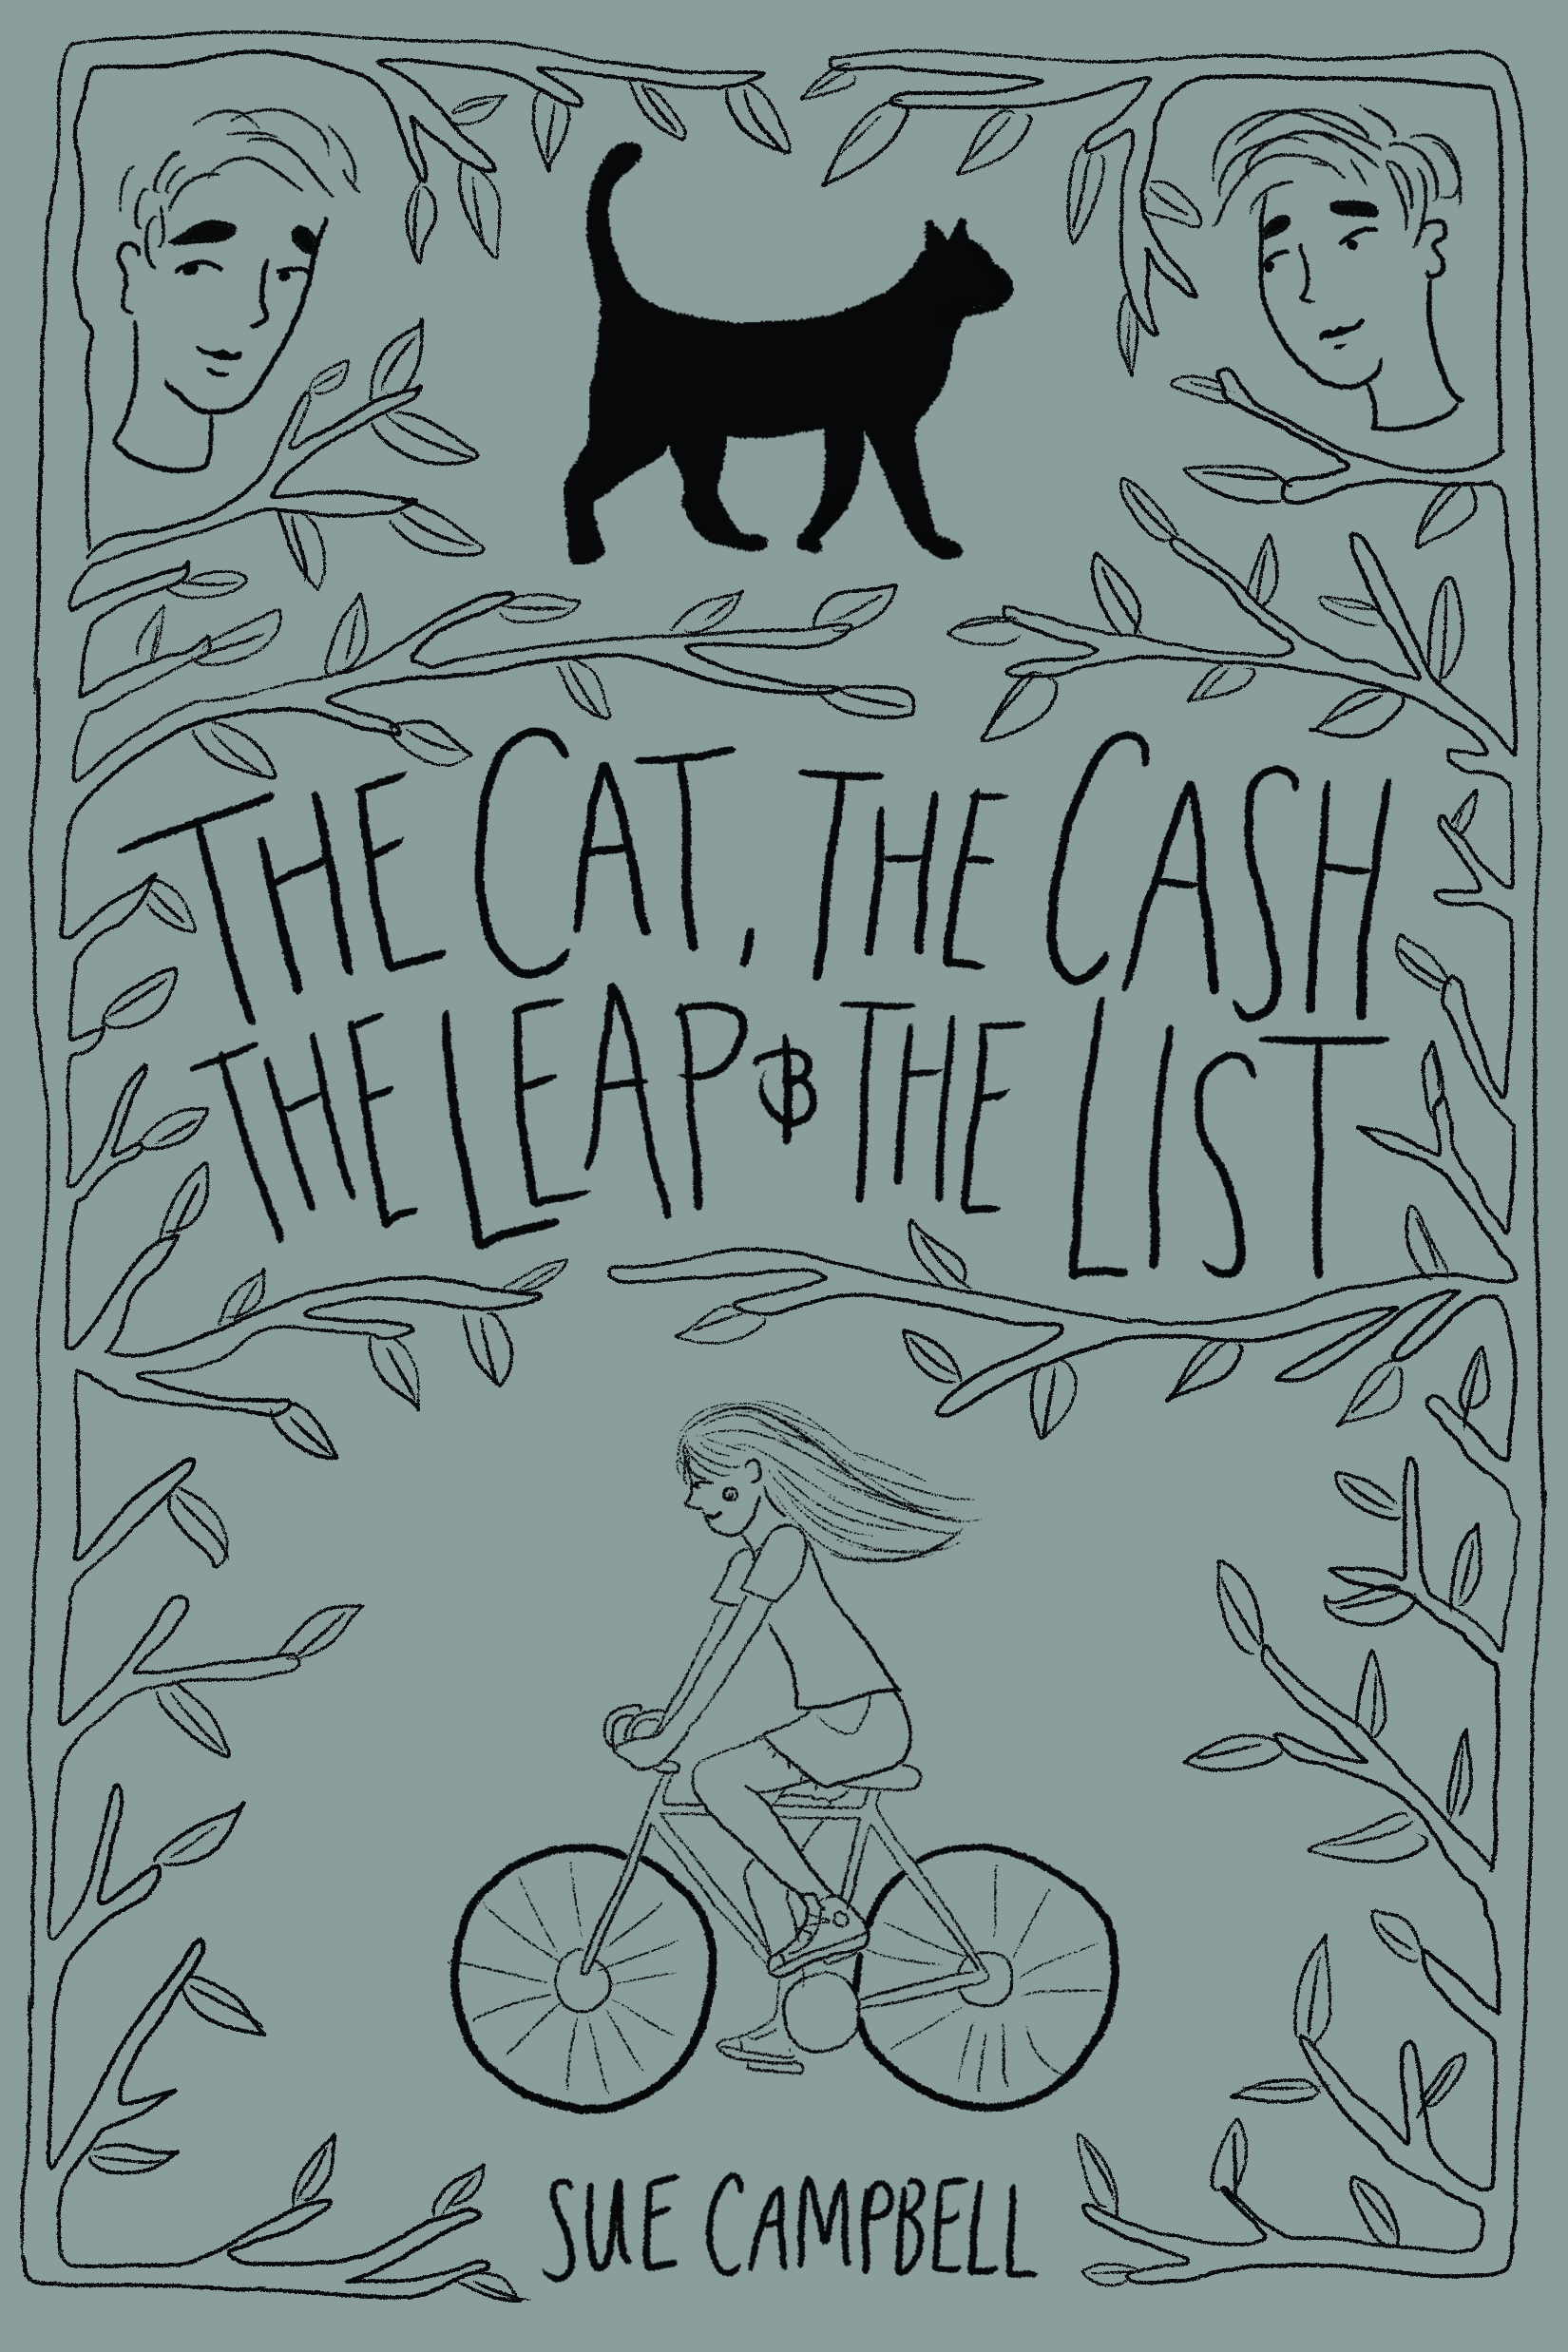 CatCash_Sketch6.jpg